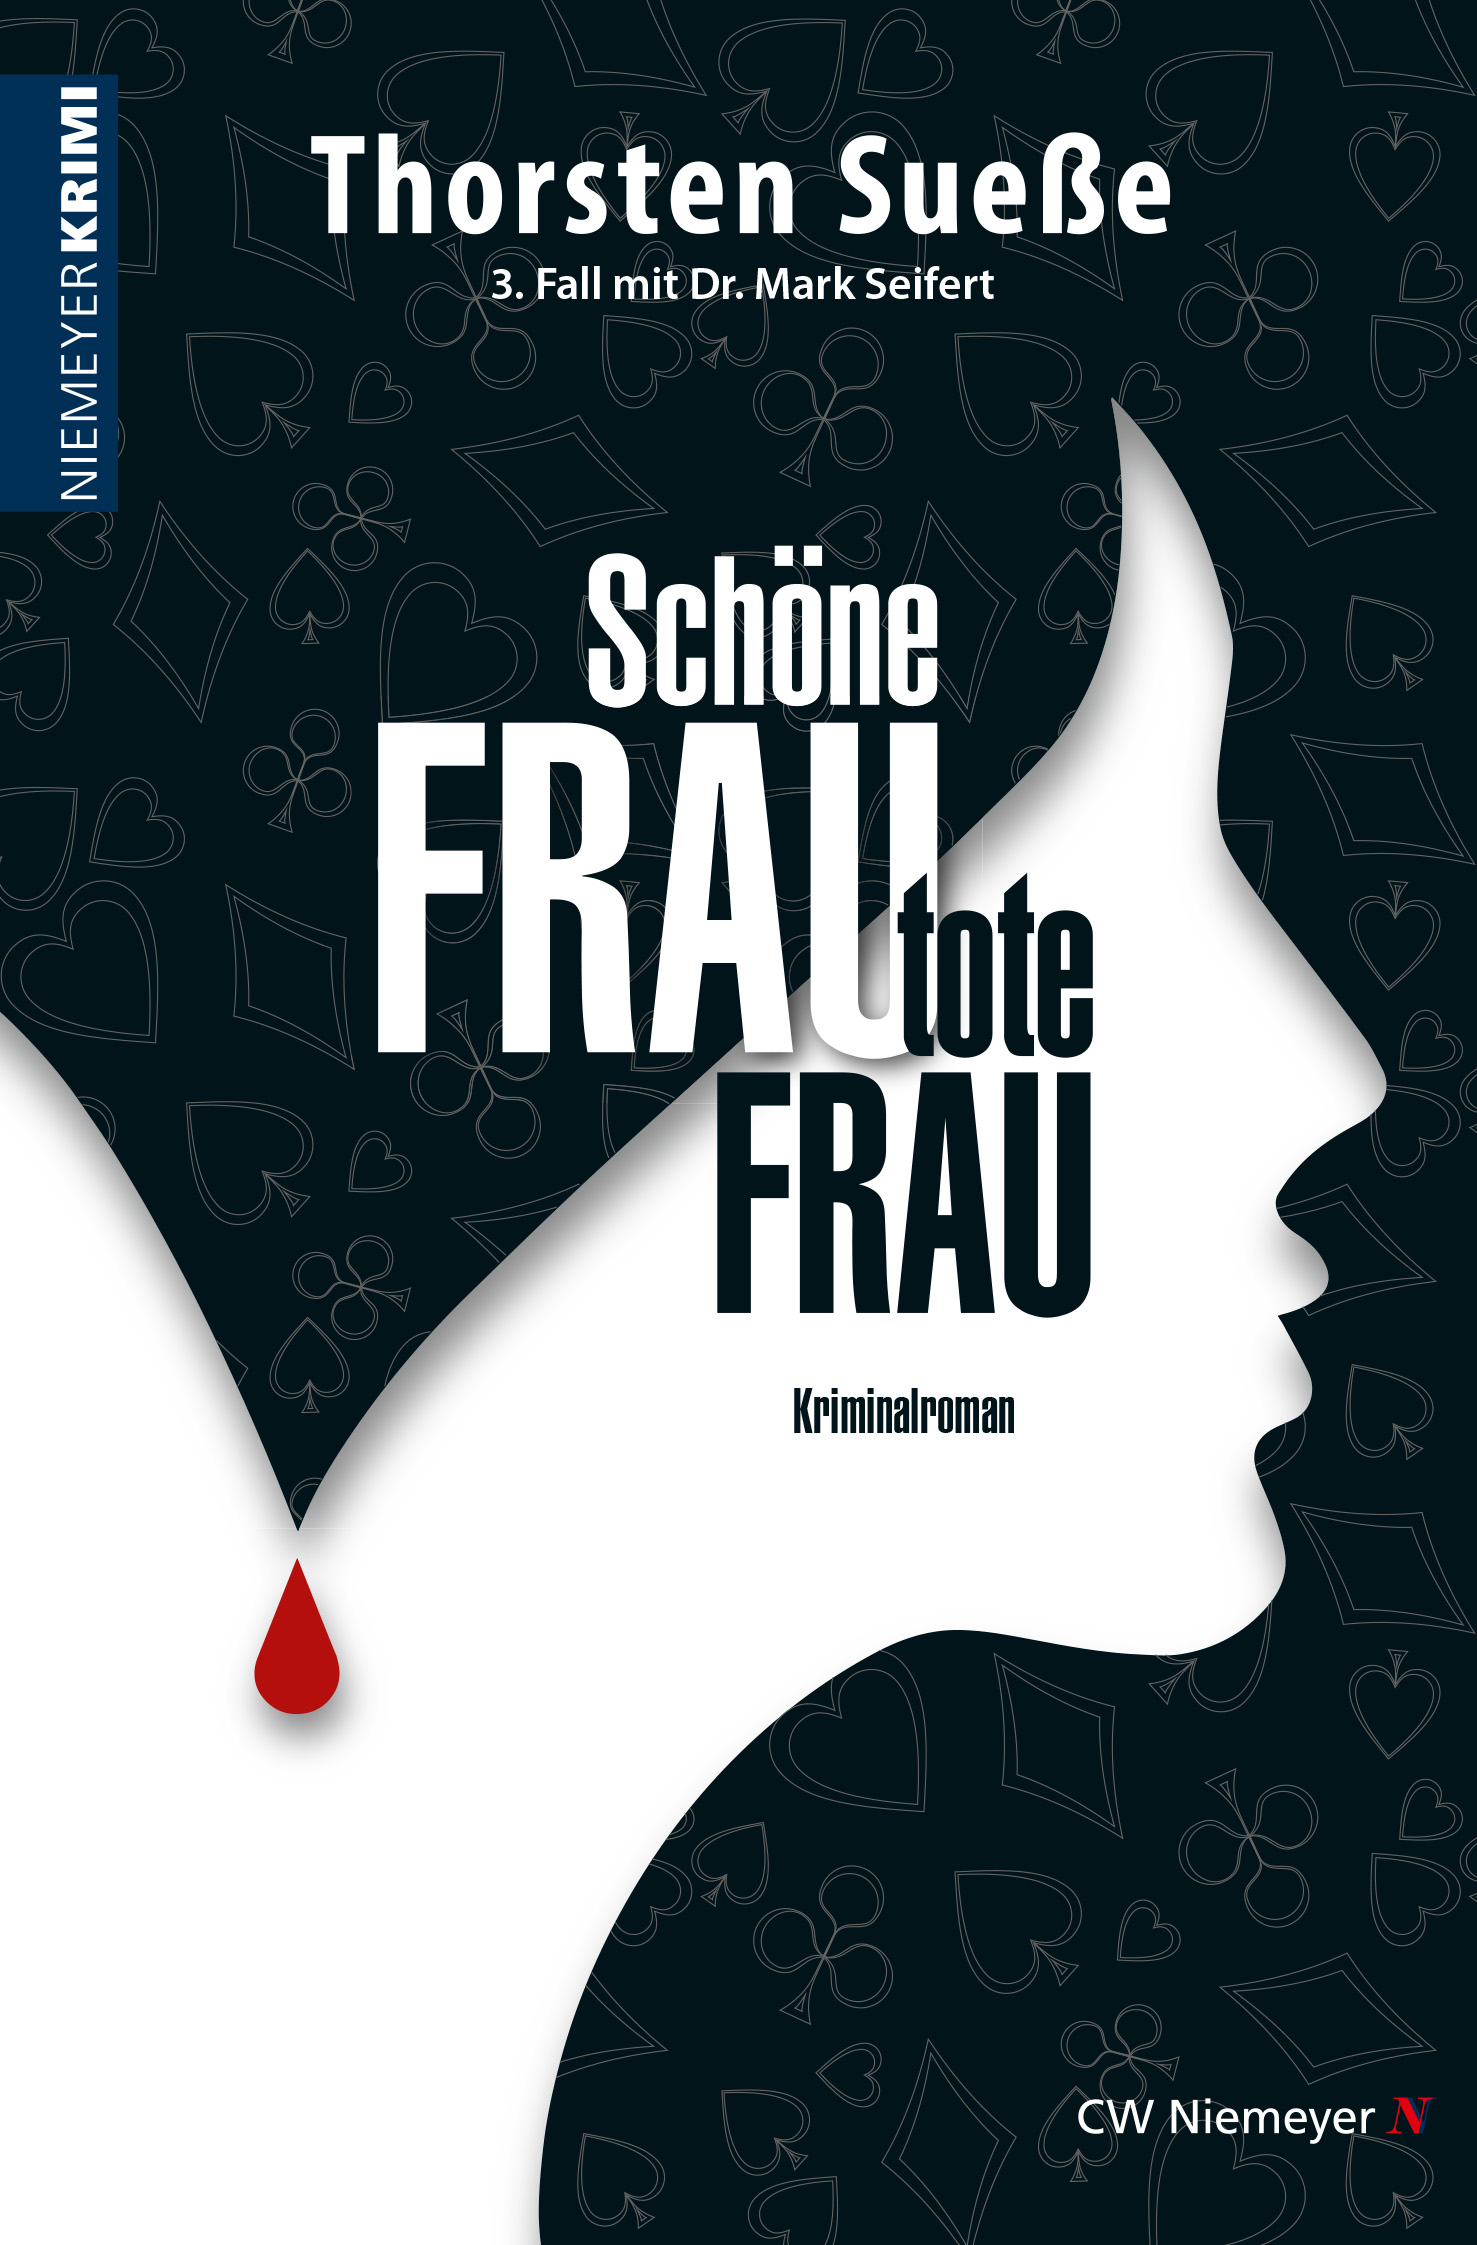 Thorsten-Suesse-Schoene-Frau-tote-Frau-9783827194671